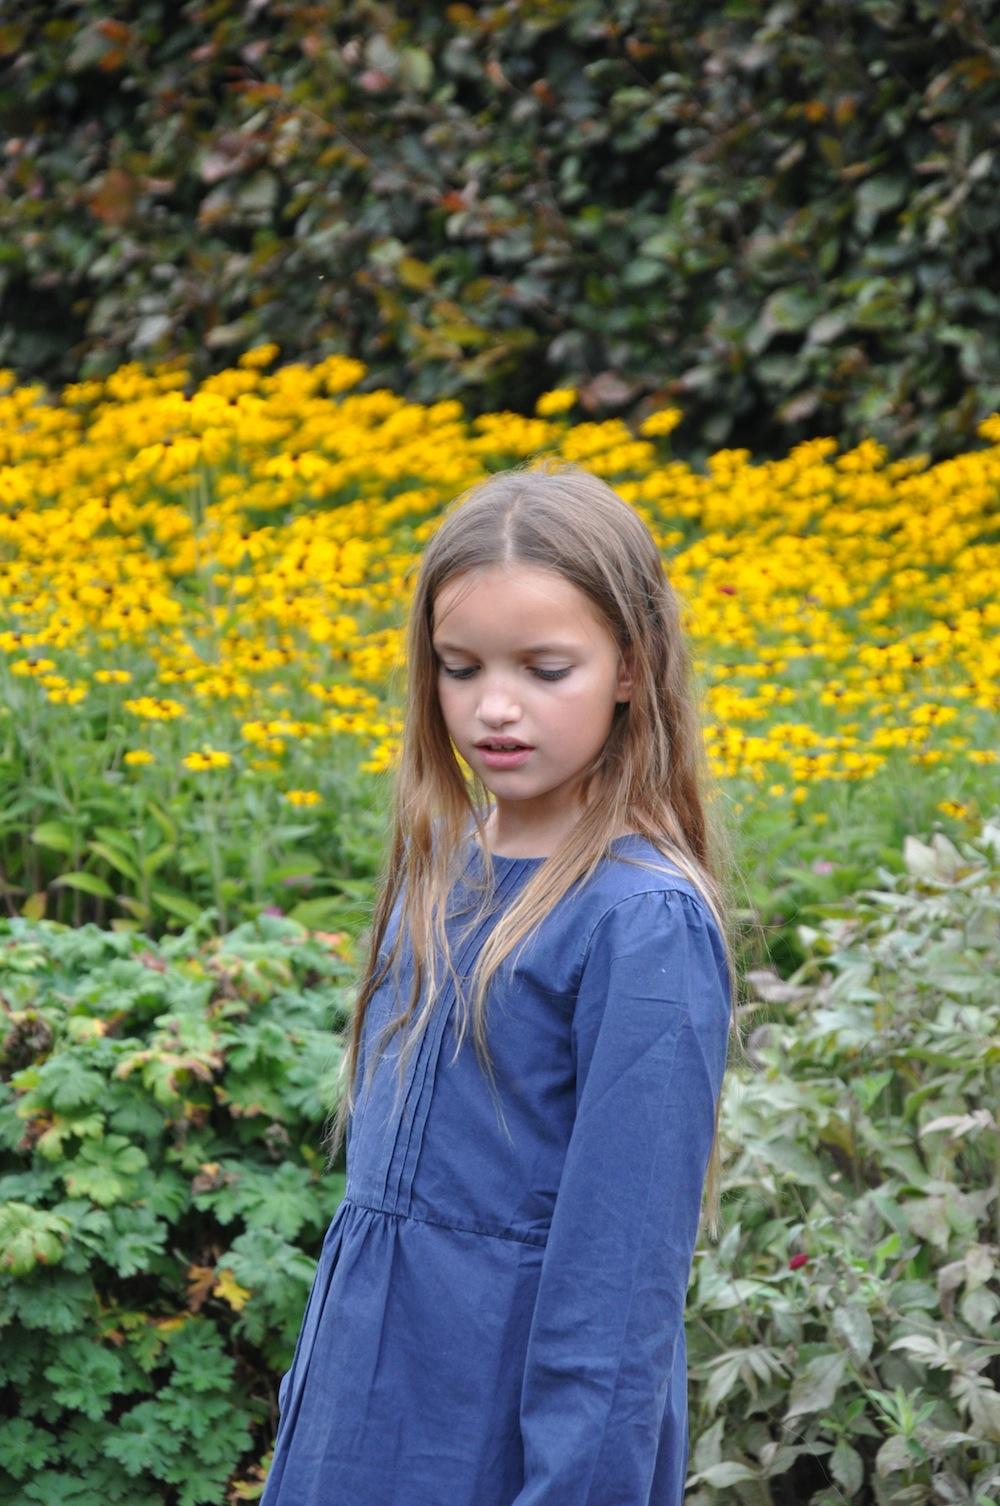 Iz_miller_elias_grace_yellow_flowers